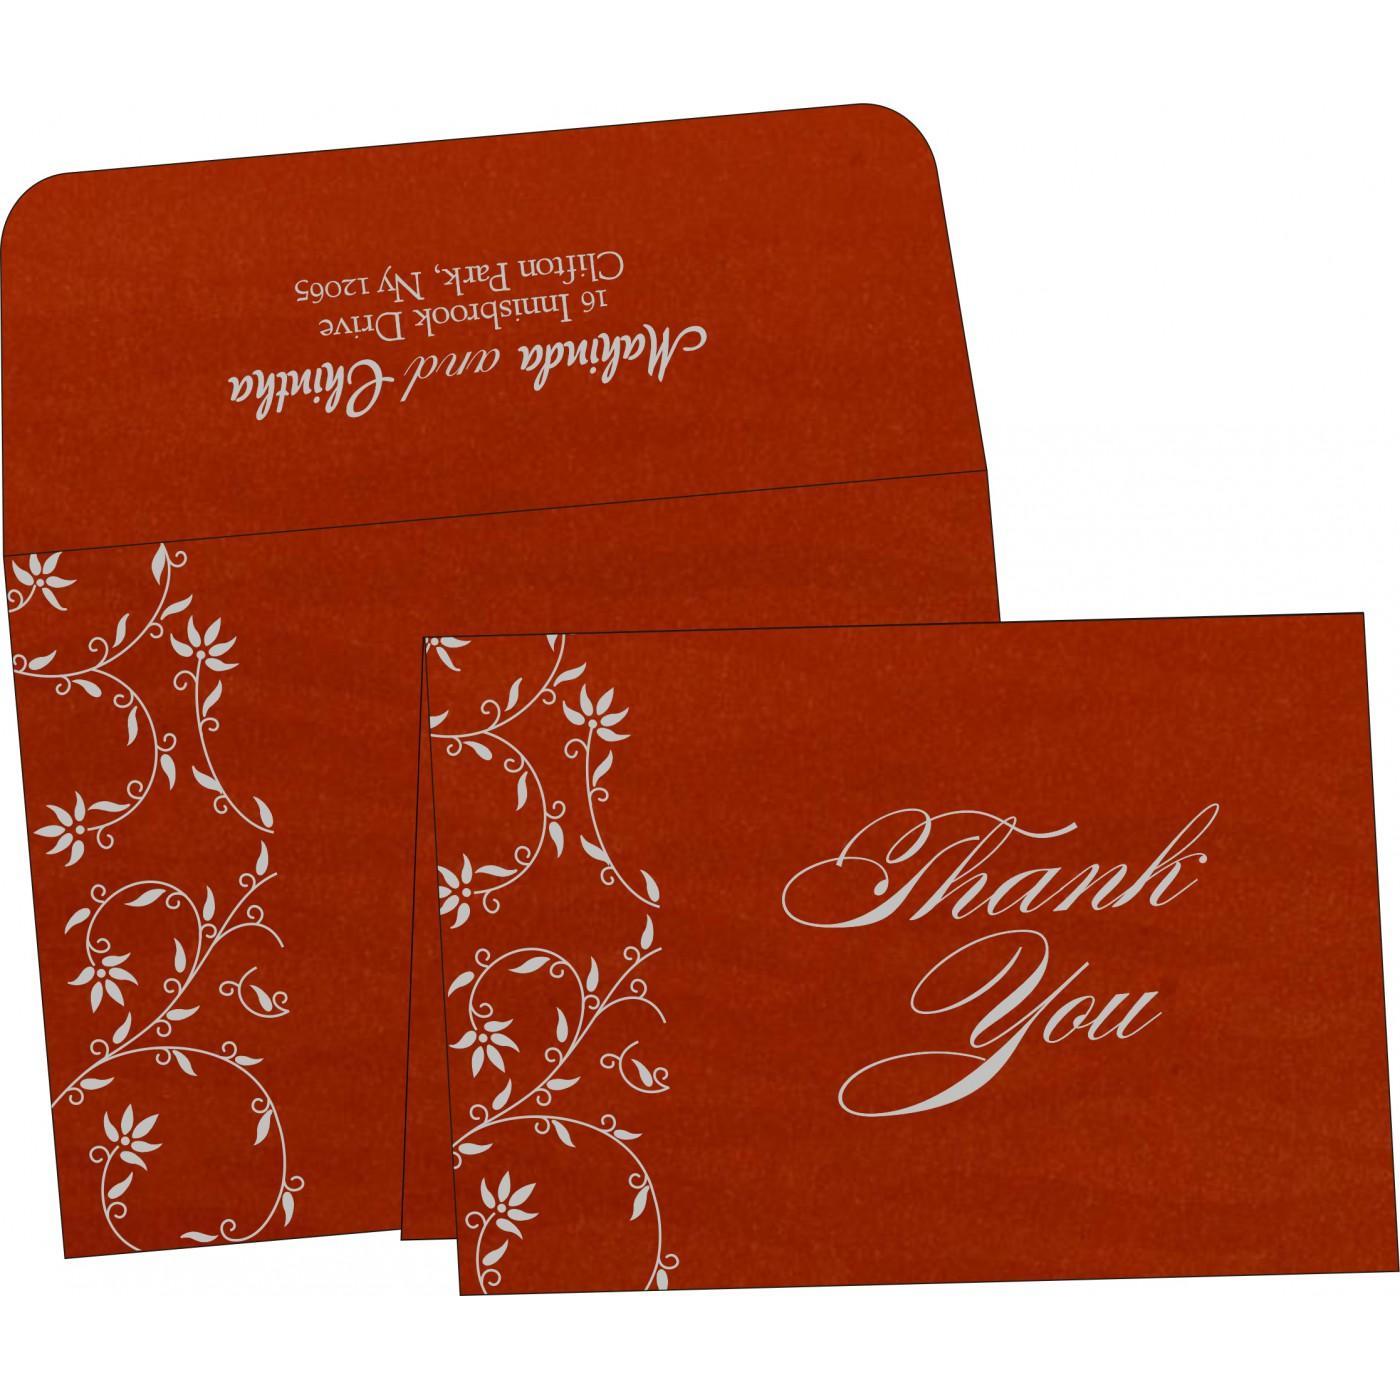 Thank You Cards : TYC-8226I - 123WeddingCards